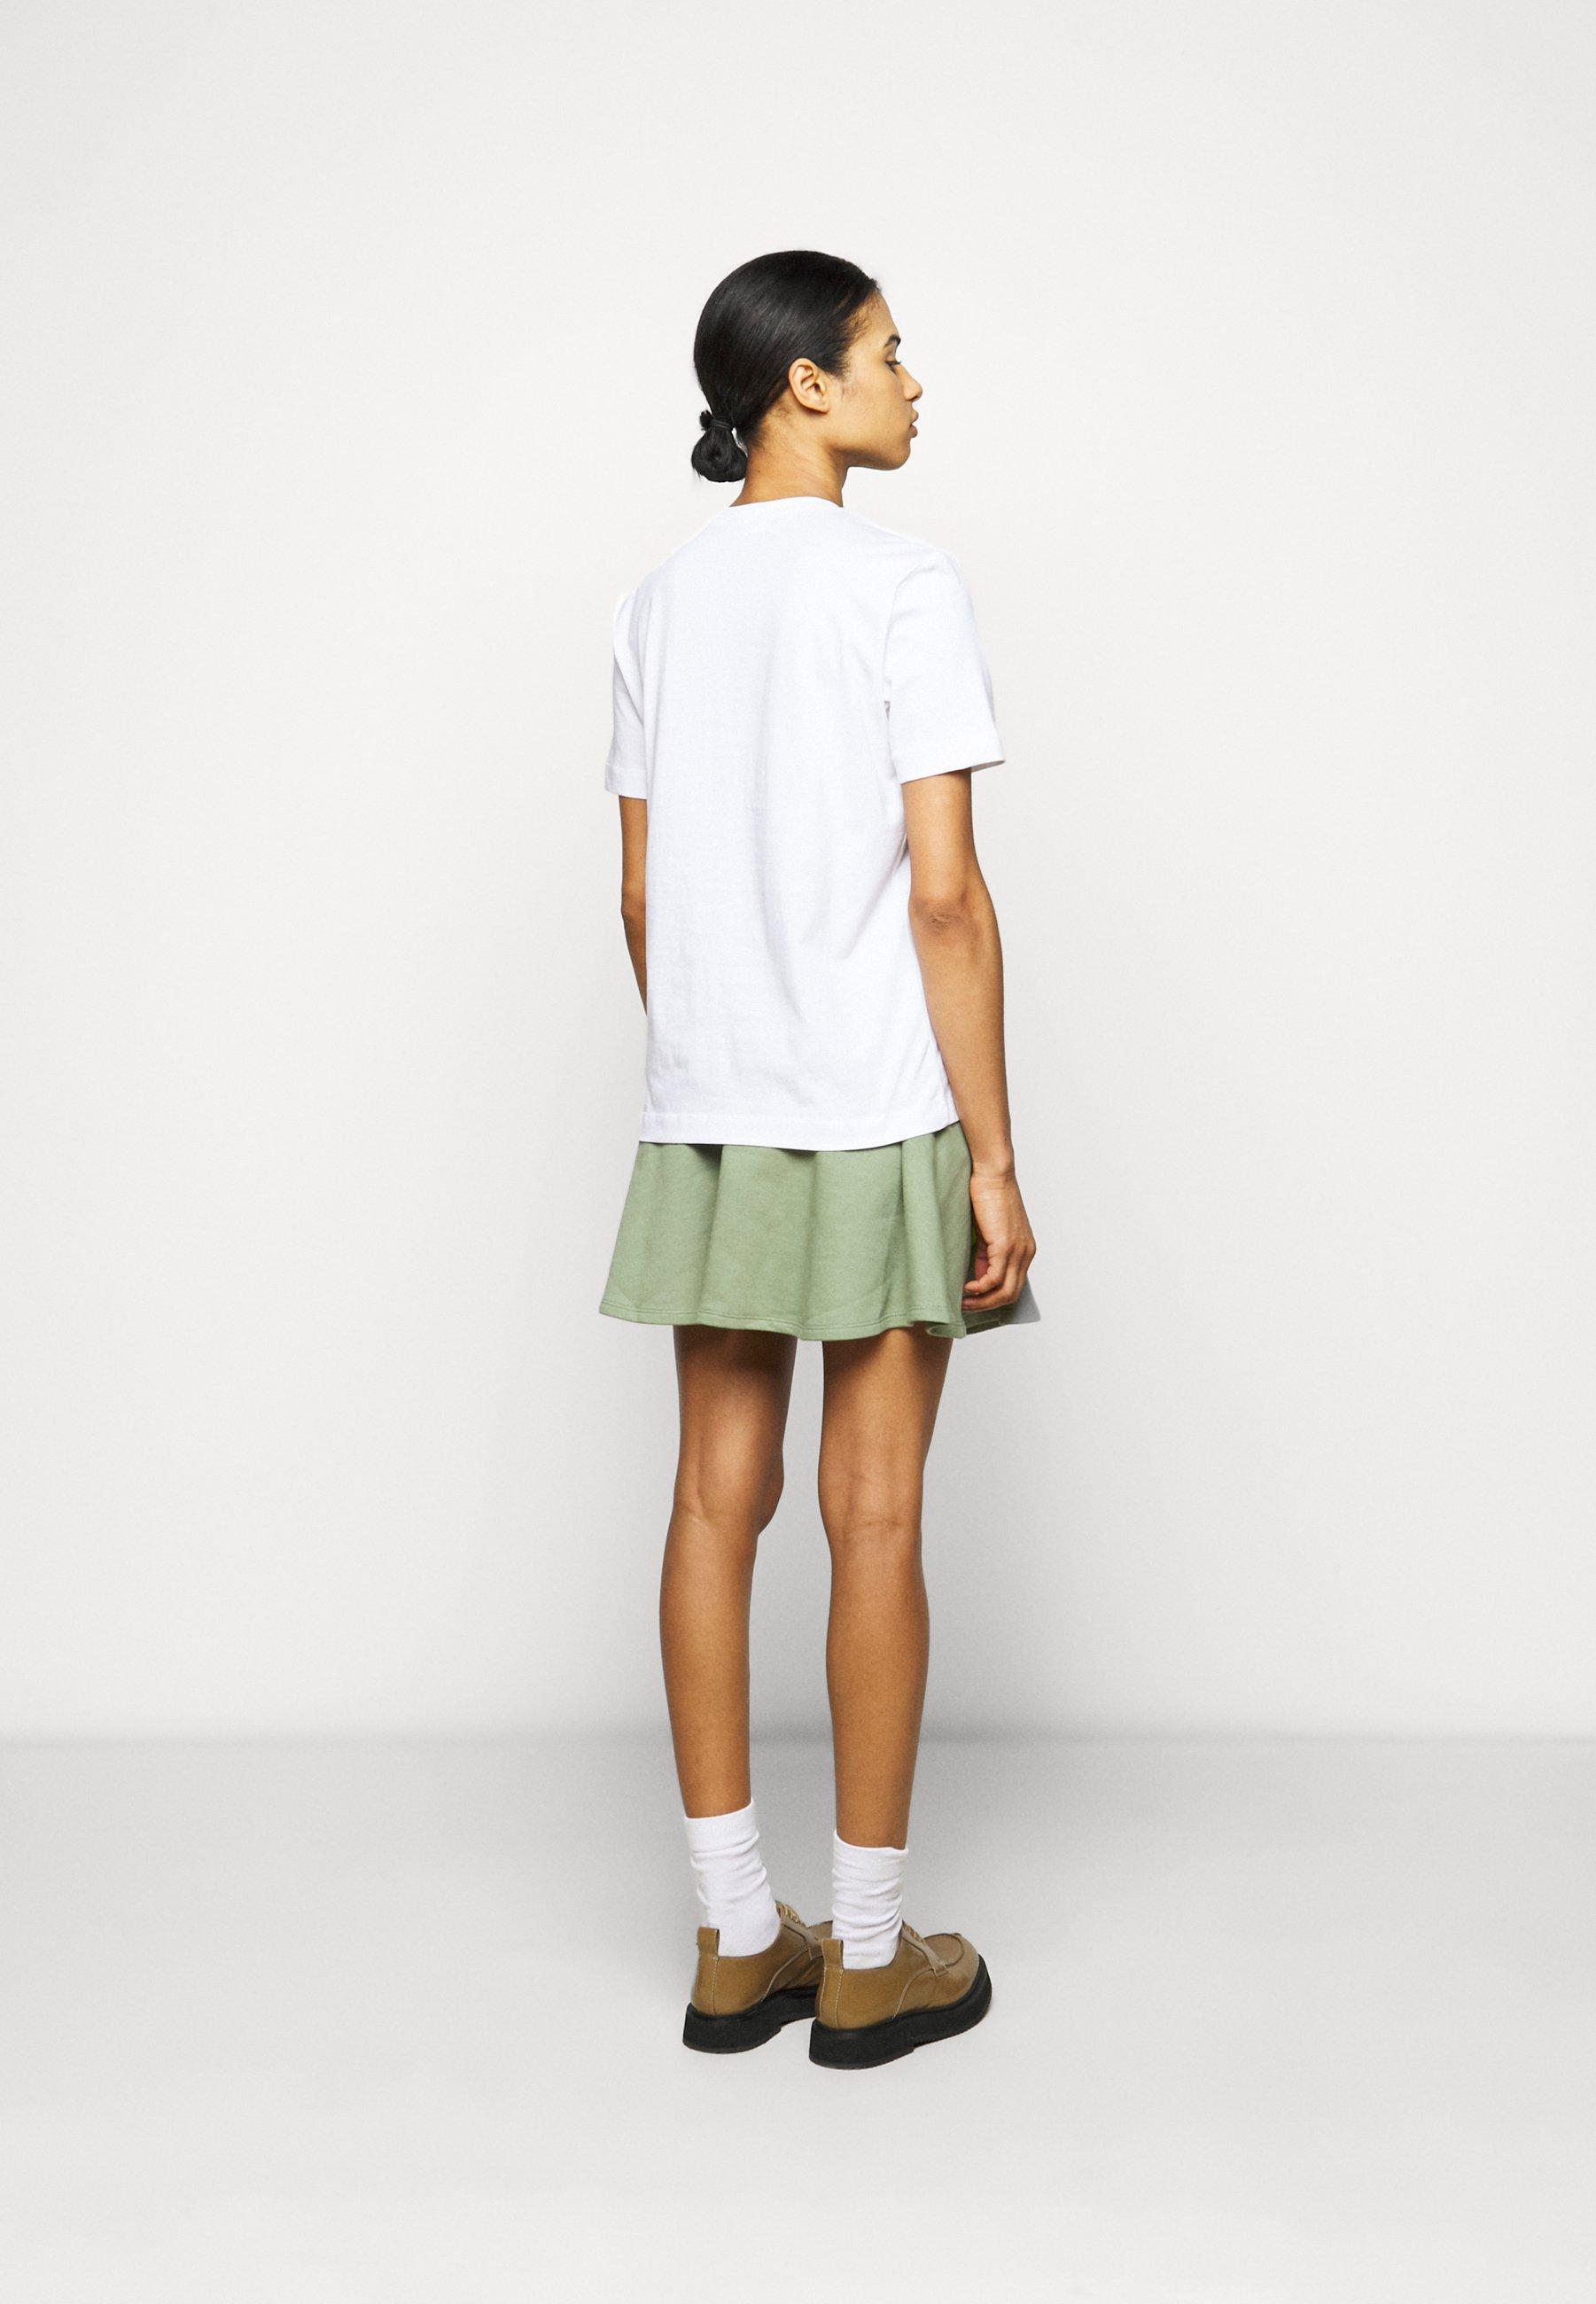 t-shirt logo rainbow love moschino LOVE MOSCHINO | T-shirt | W4H06 06 M3876A00